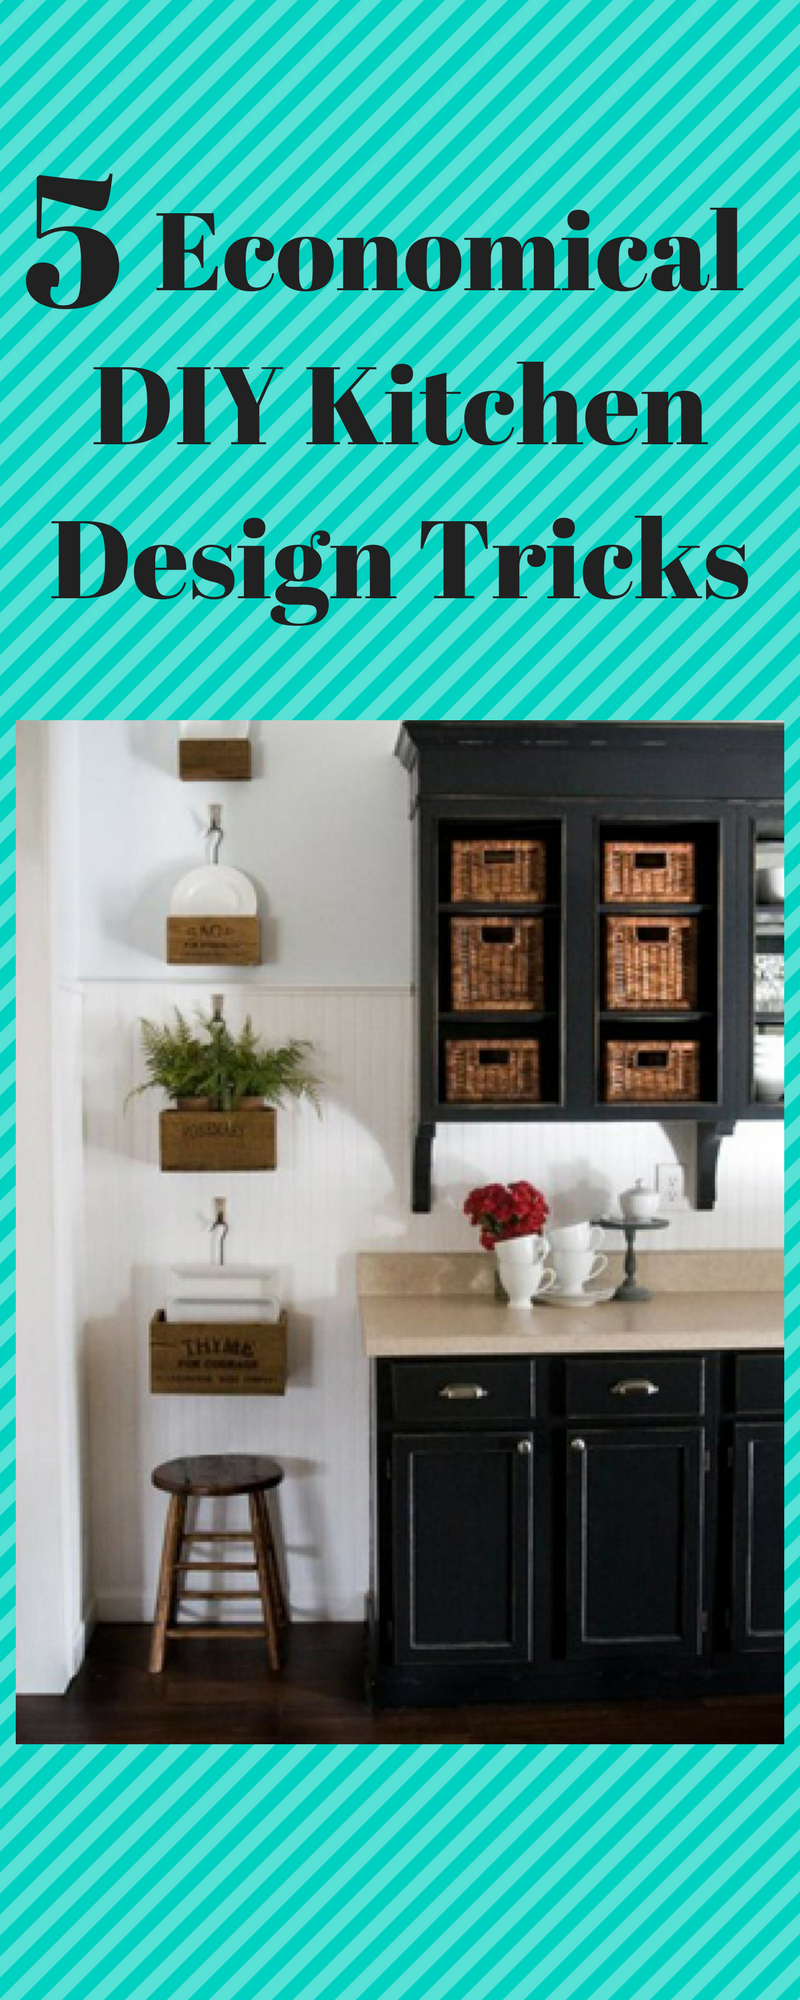 5 economical diy kitchen design tricks italian buffet and food rh pinterest com